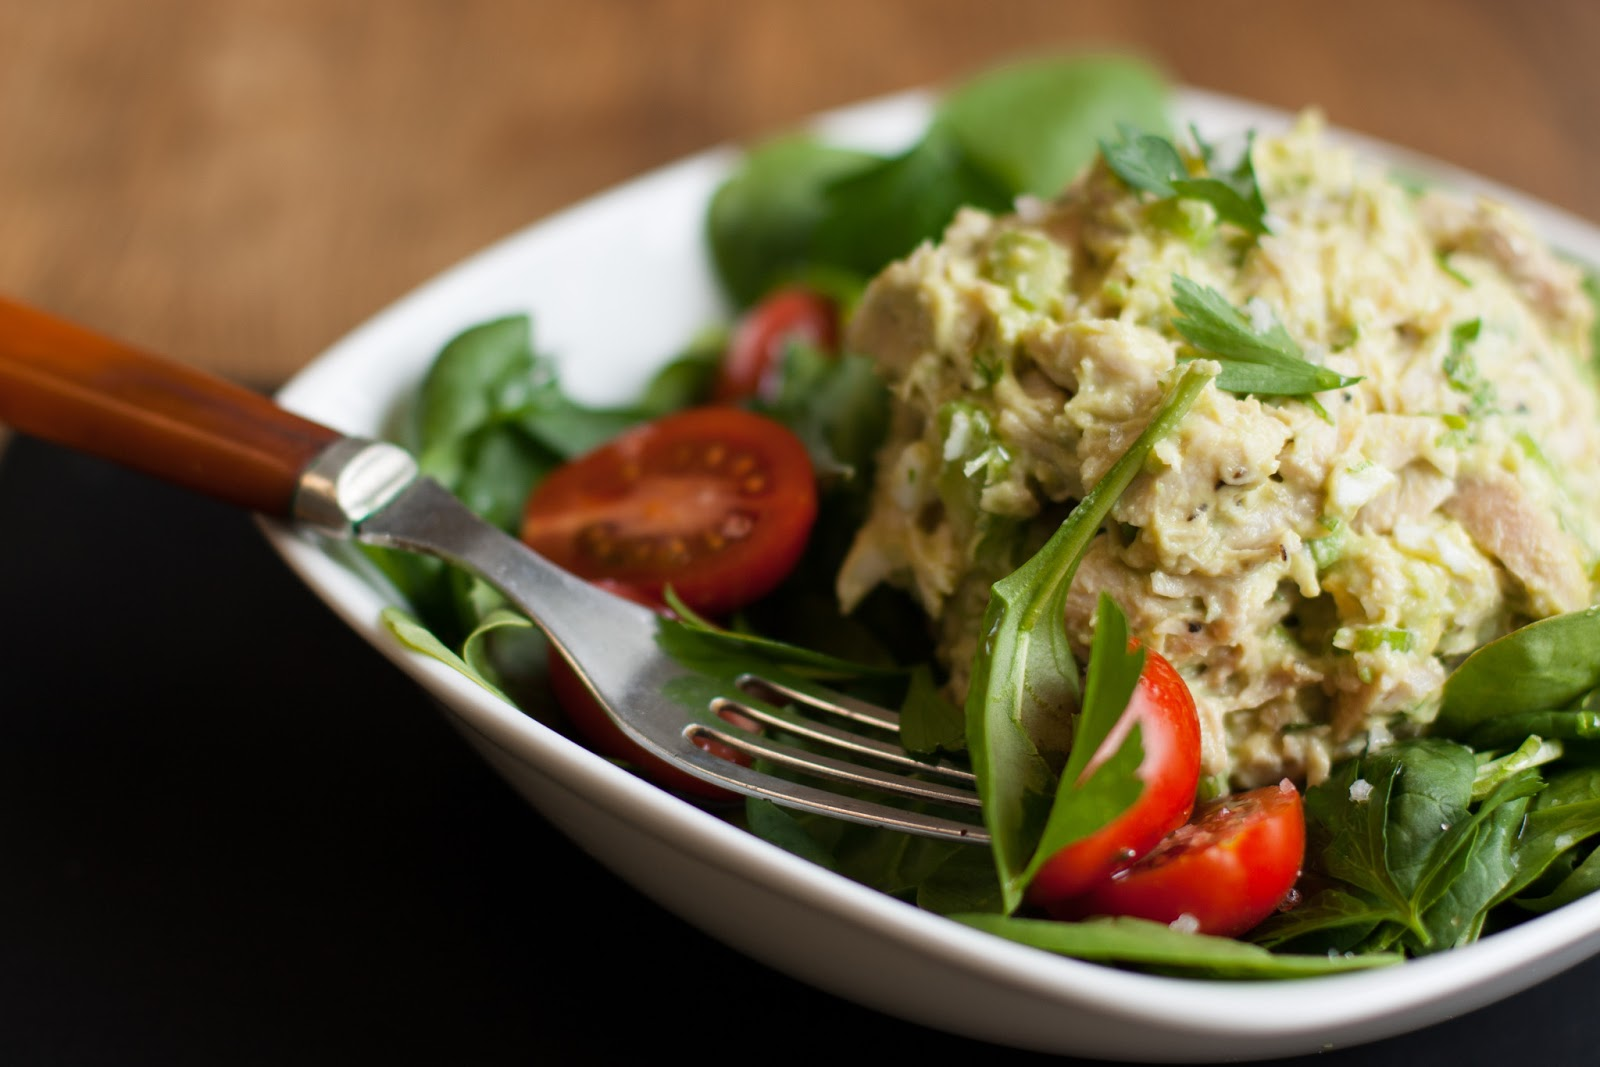 Grubarazzi: Avocado Chicken Salad